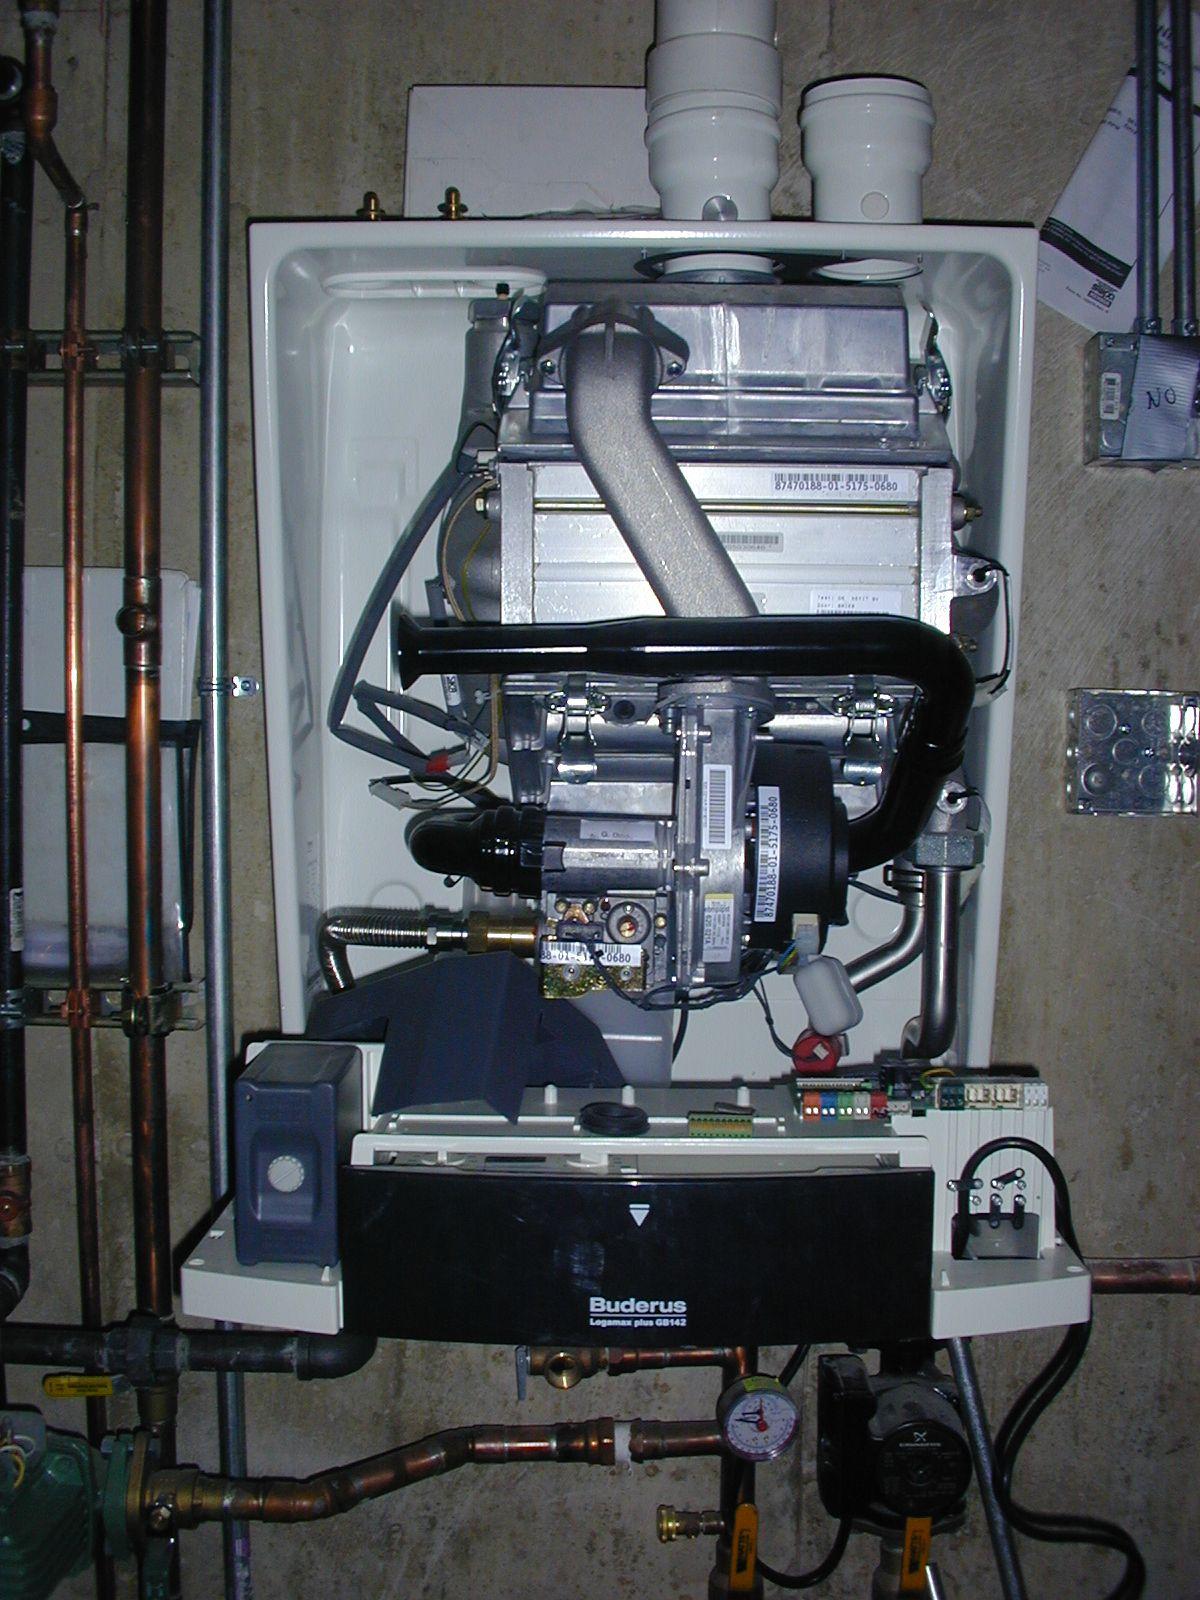 Buderus High efficient wall mount boiler